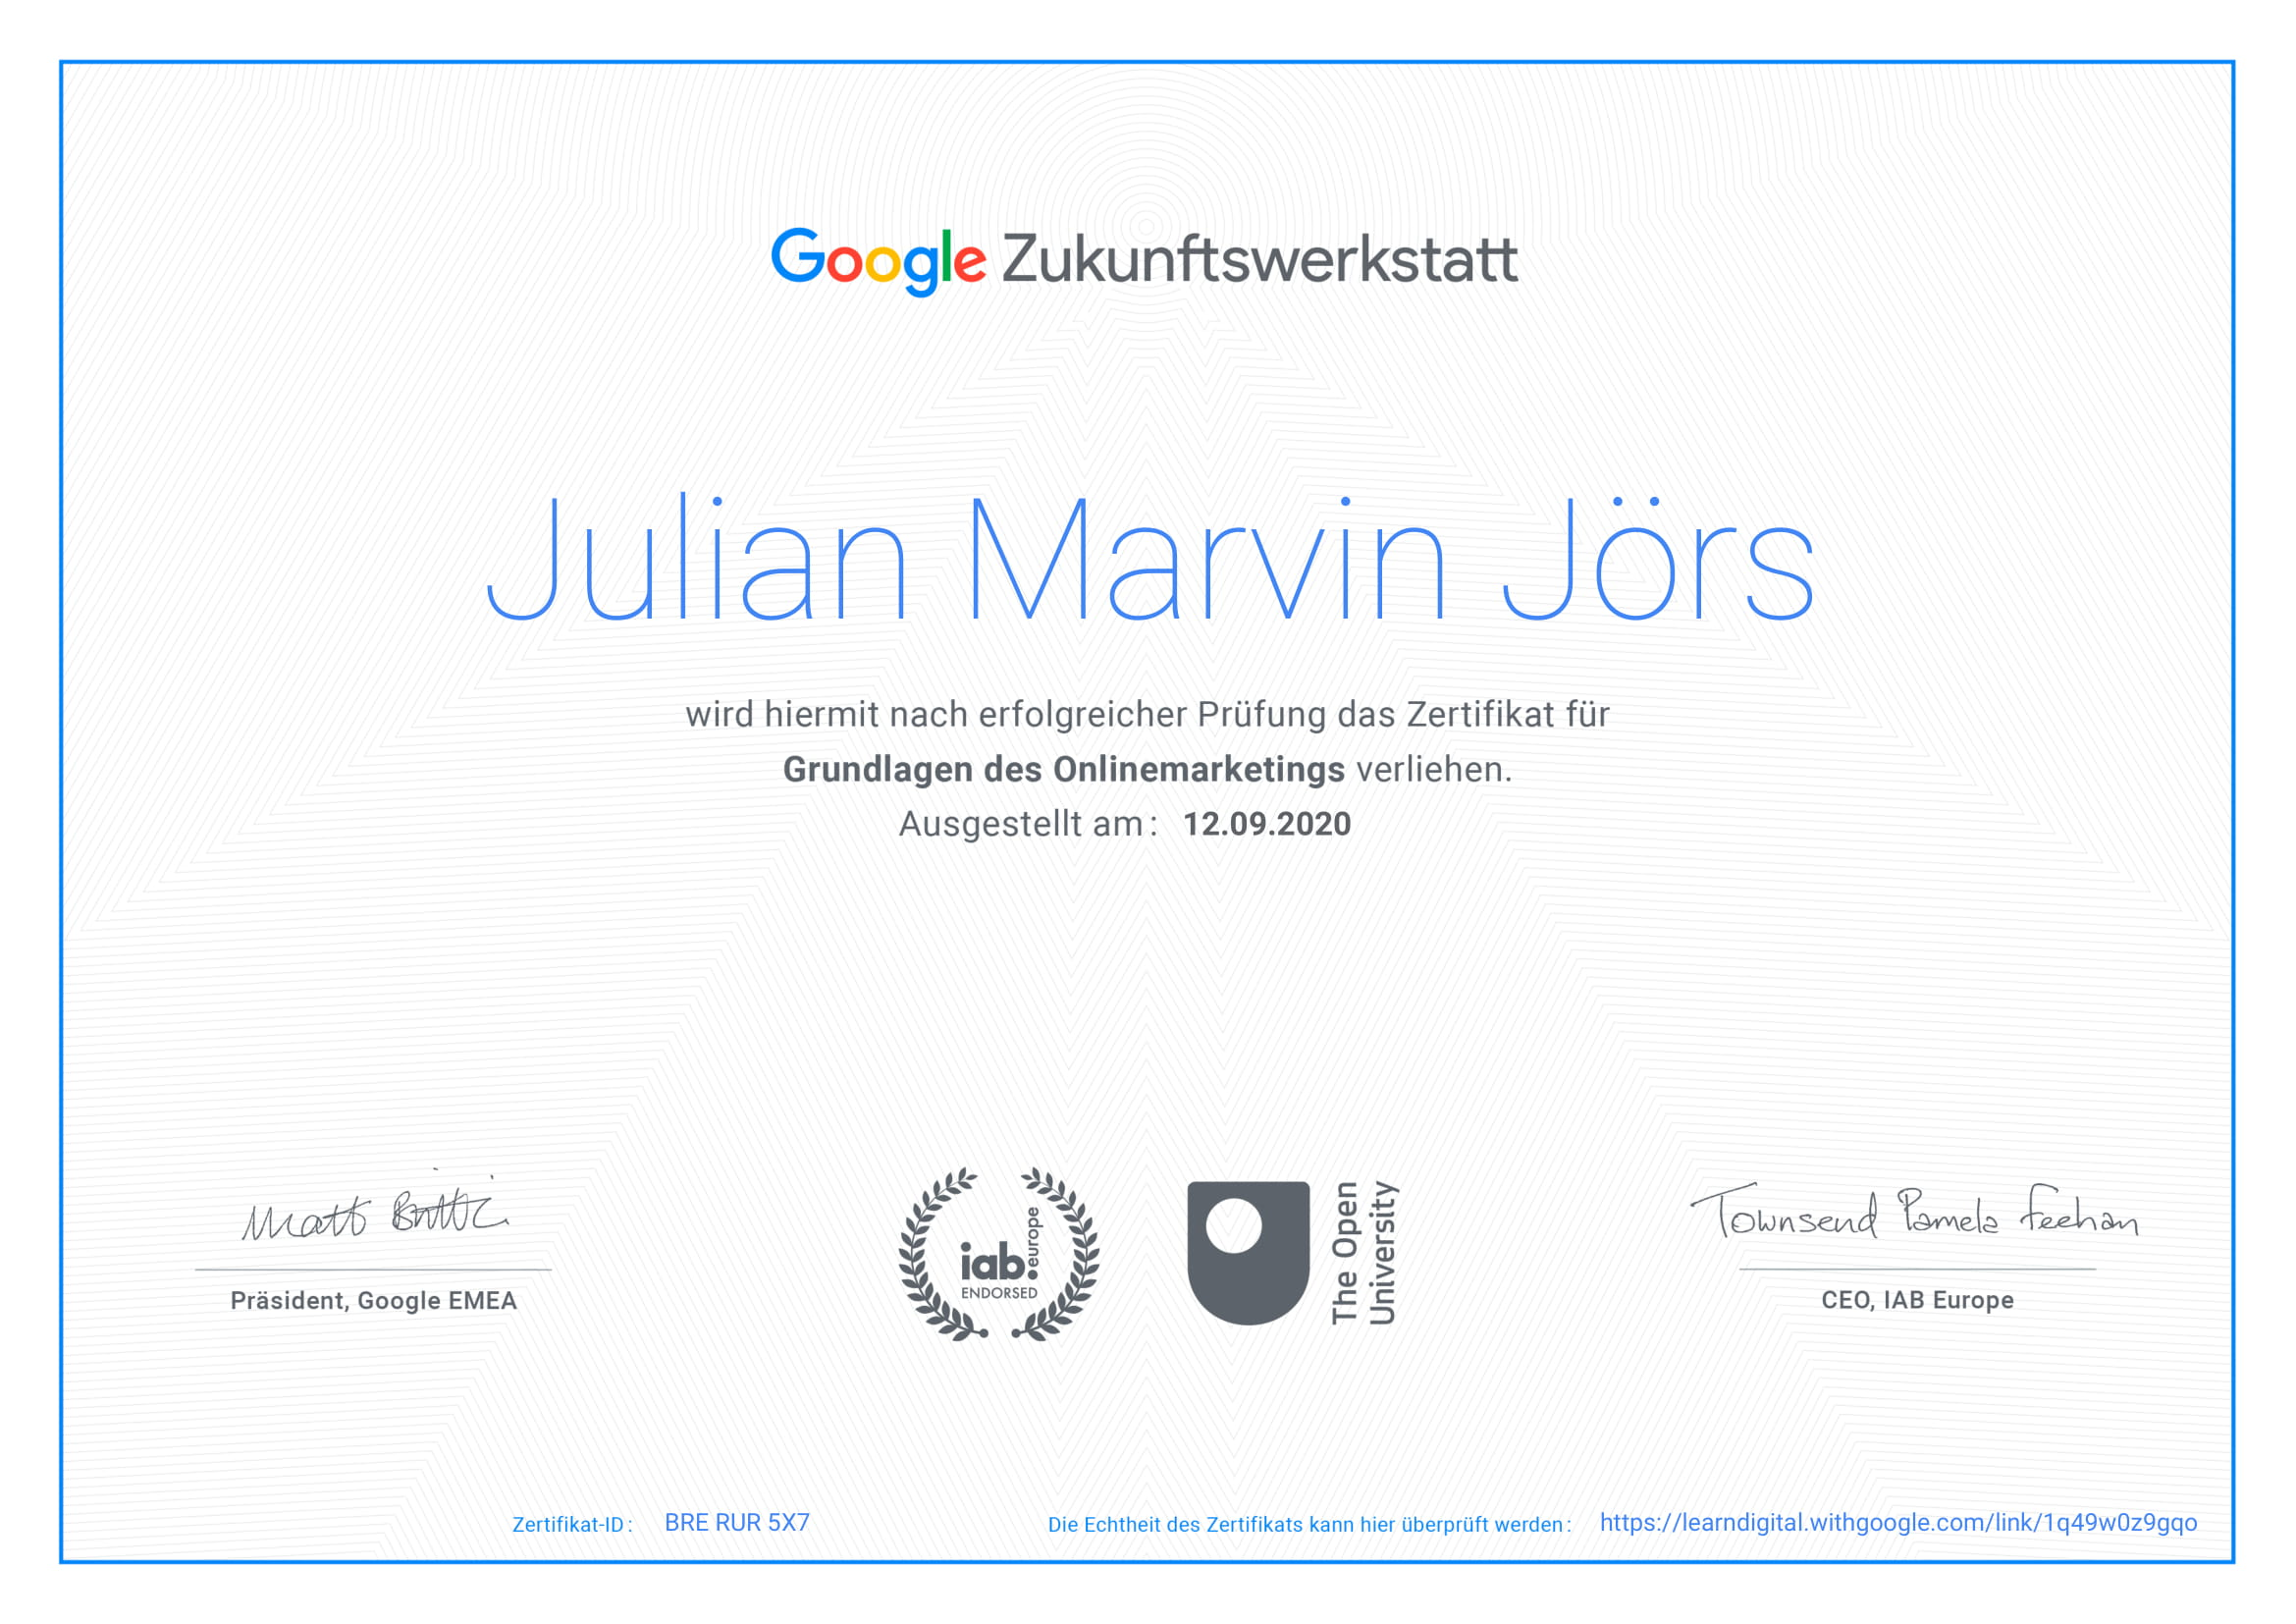 Zertifikat Google Zukunftswerkstatt-1